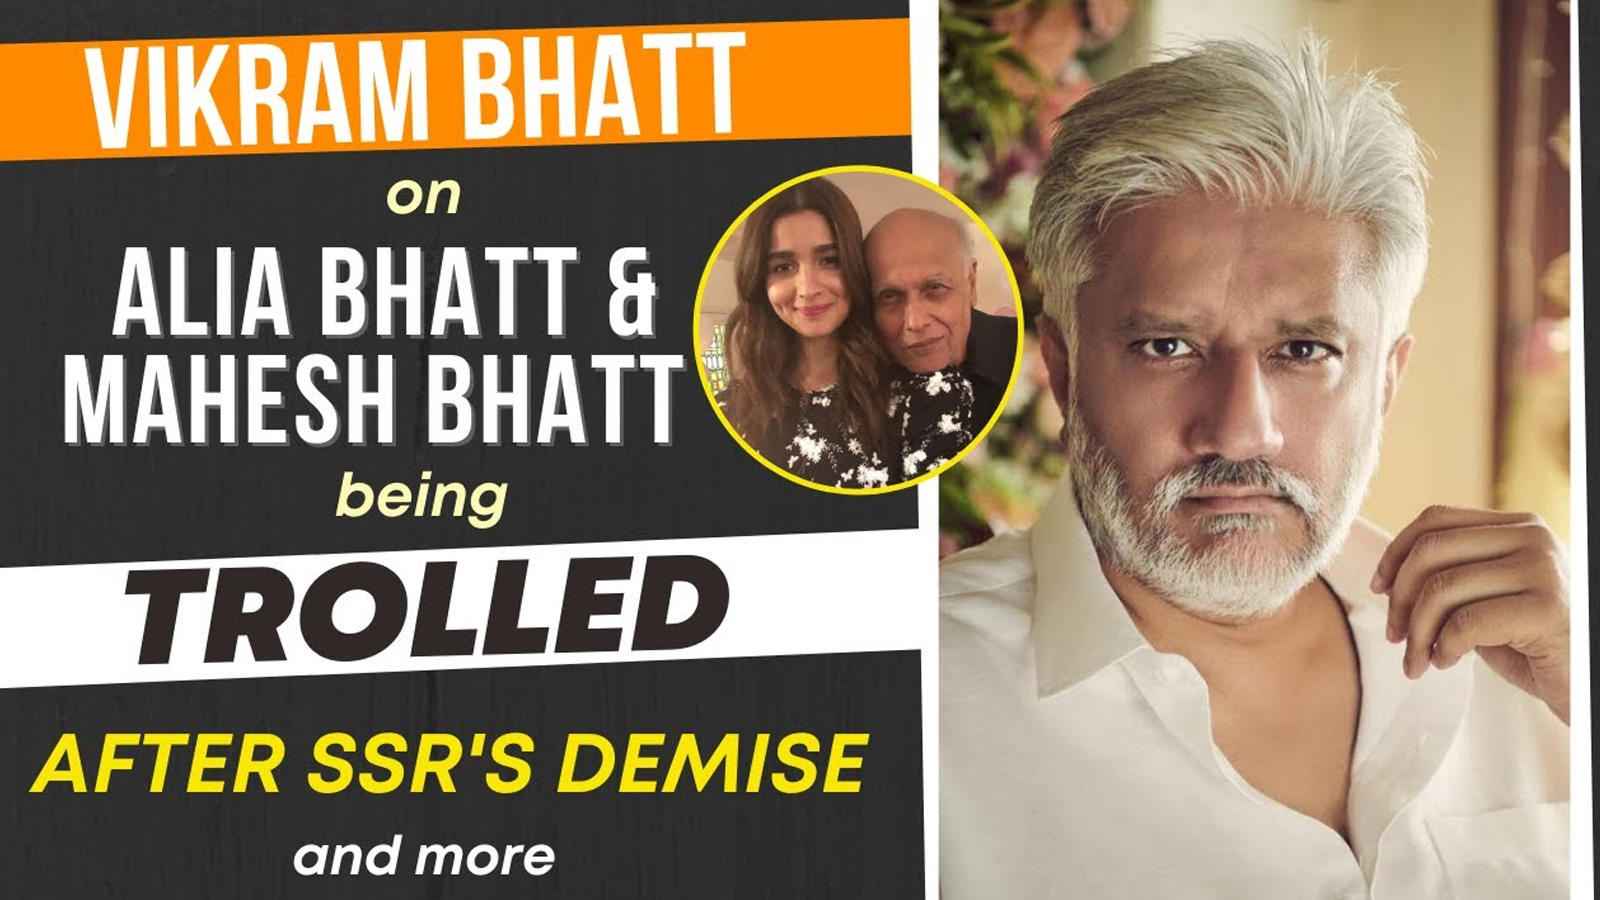 Vikram Bhatt opens up about Mahesh Bhatt and Alia Bhatt getting trolled after Sushant Singh Rajput's death   Hindi Movie News – Bollywood – Times of India